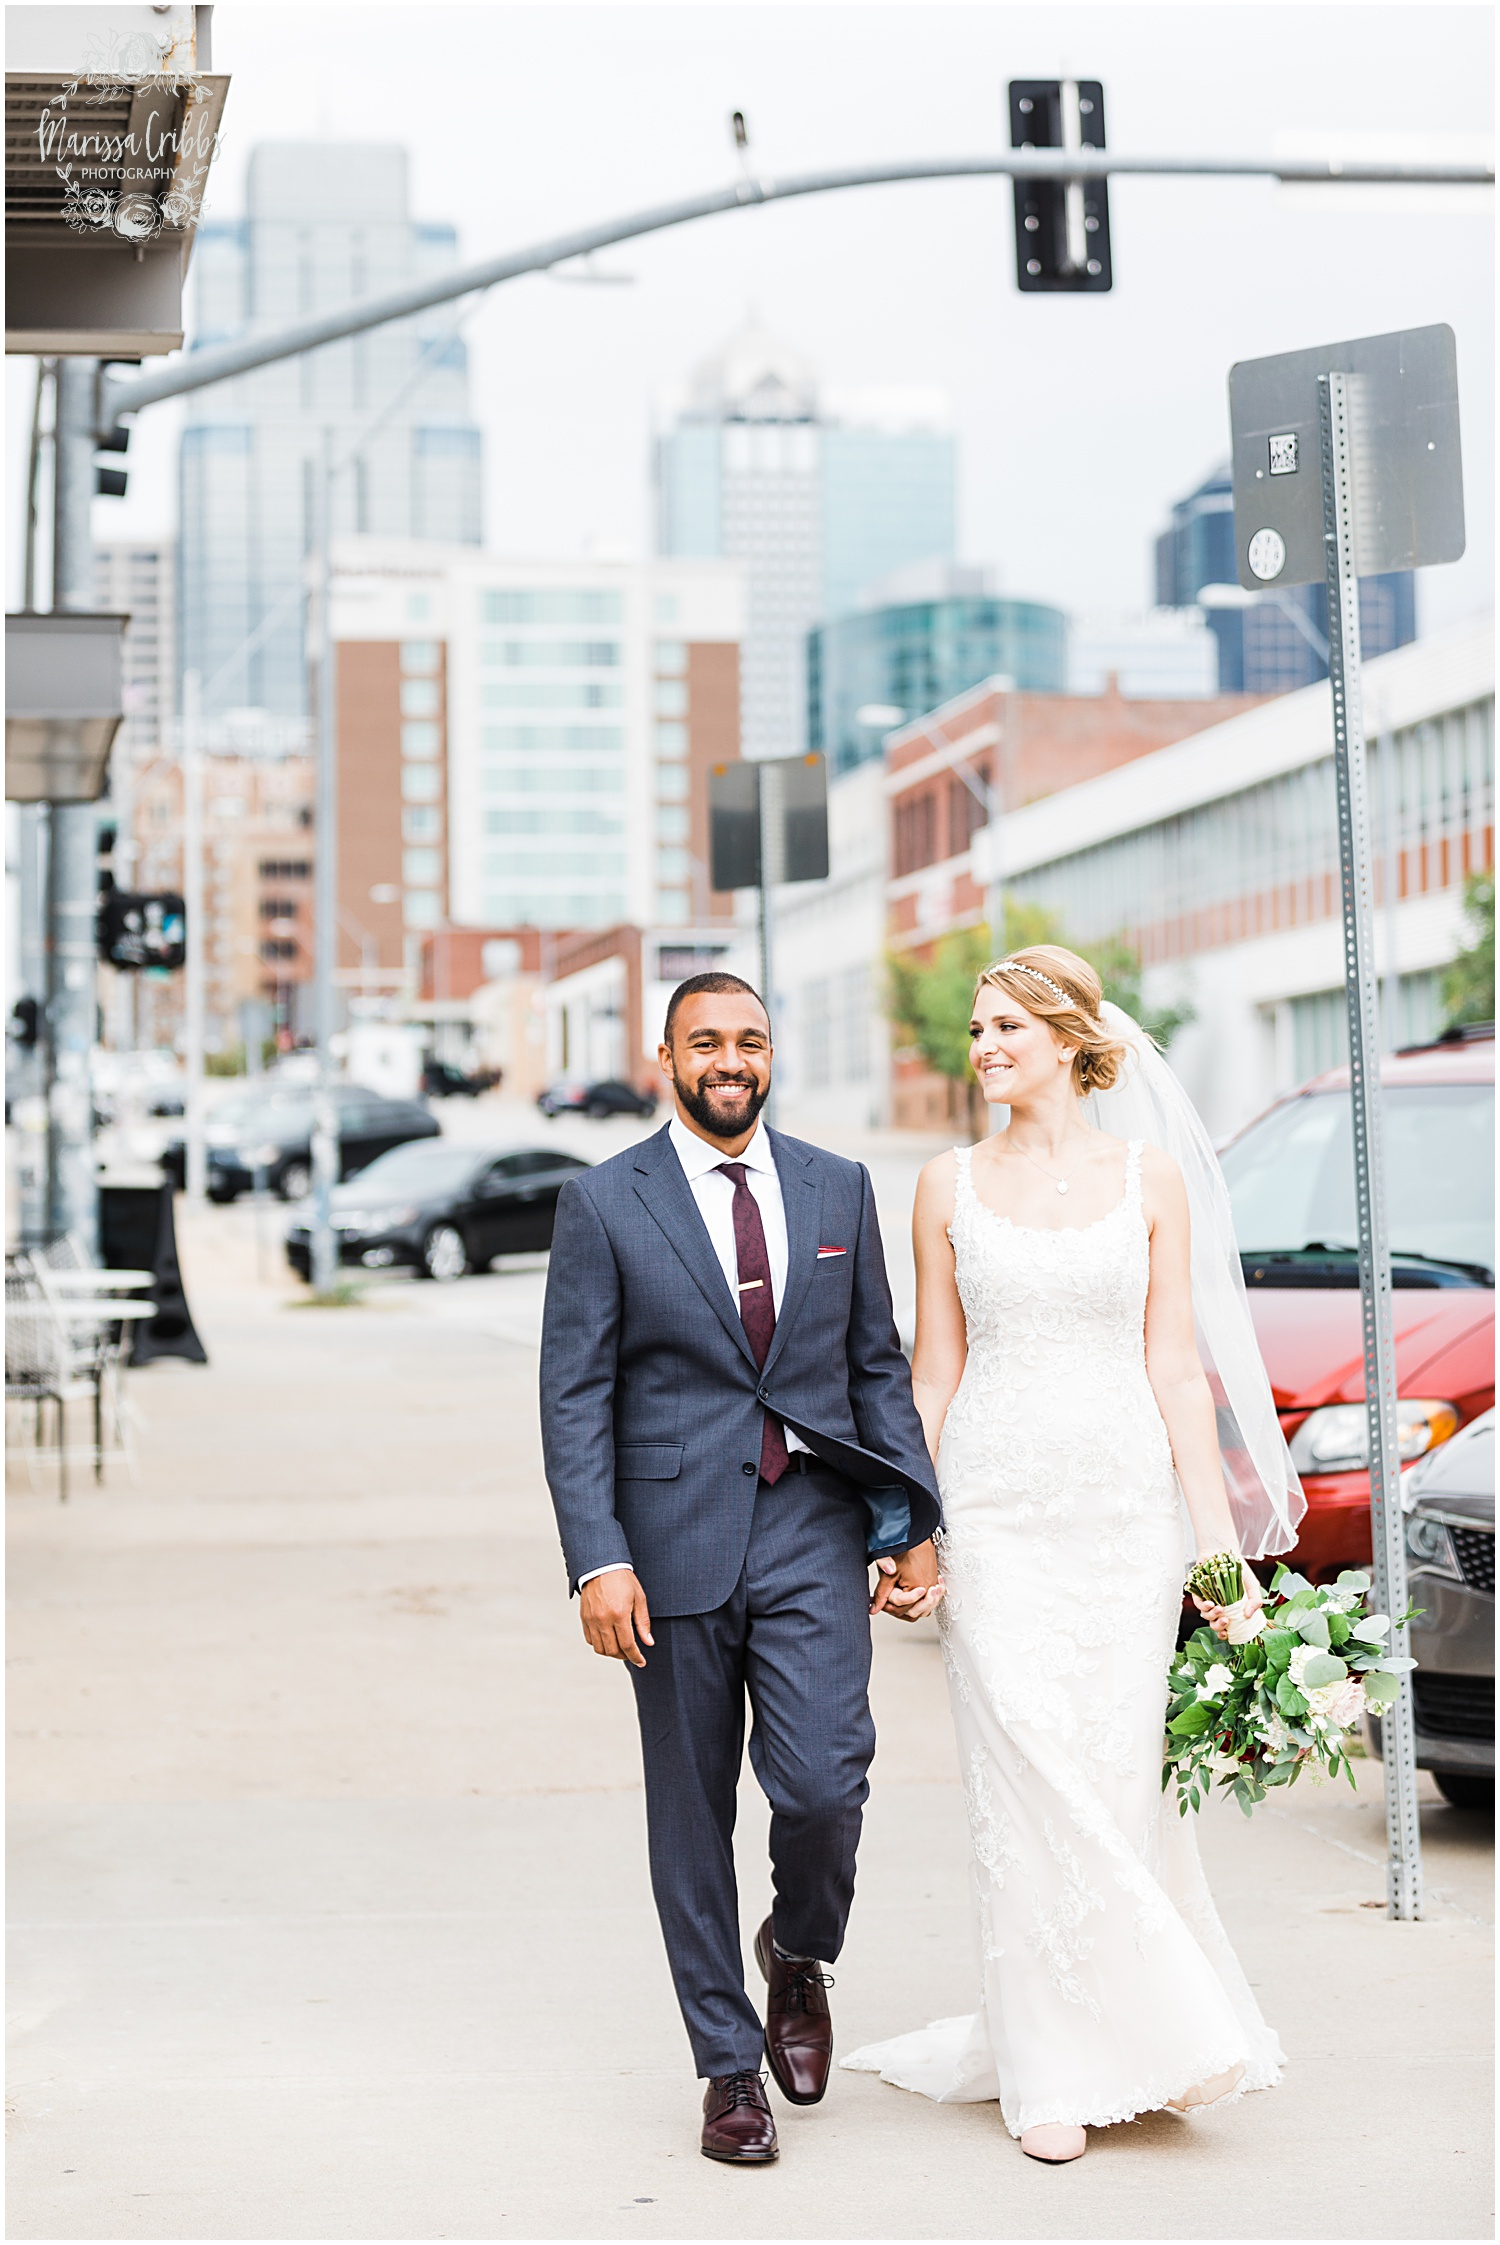 BAUER WEDDING   KELSEA & JUSTIN   MARISSA CRIBBS PHOTOGRAPHY_6532.jpg